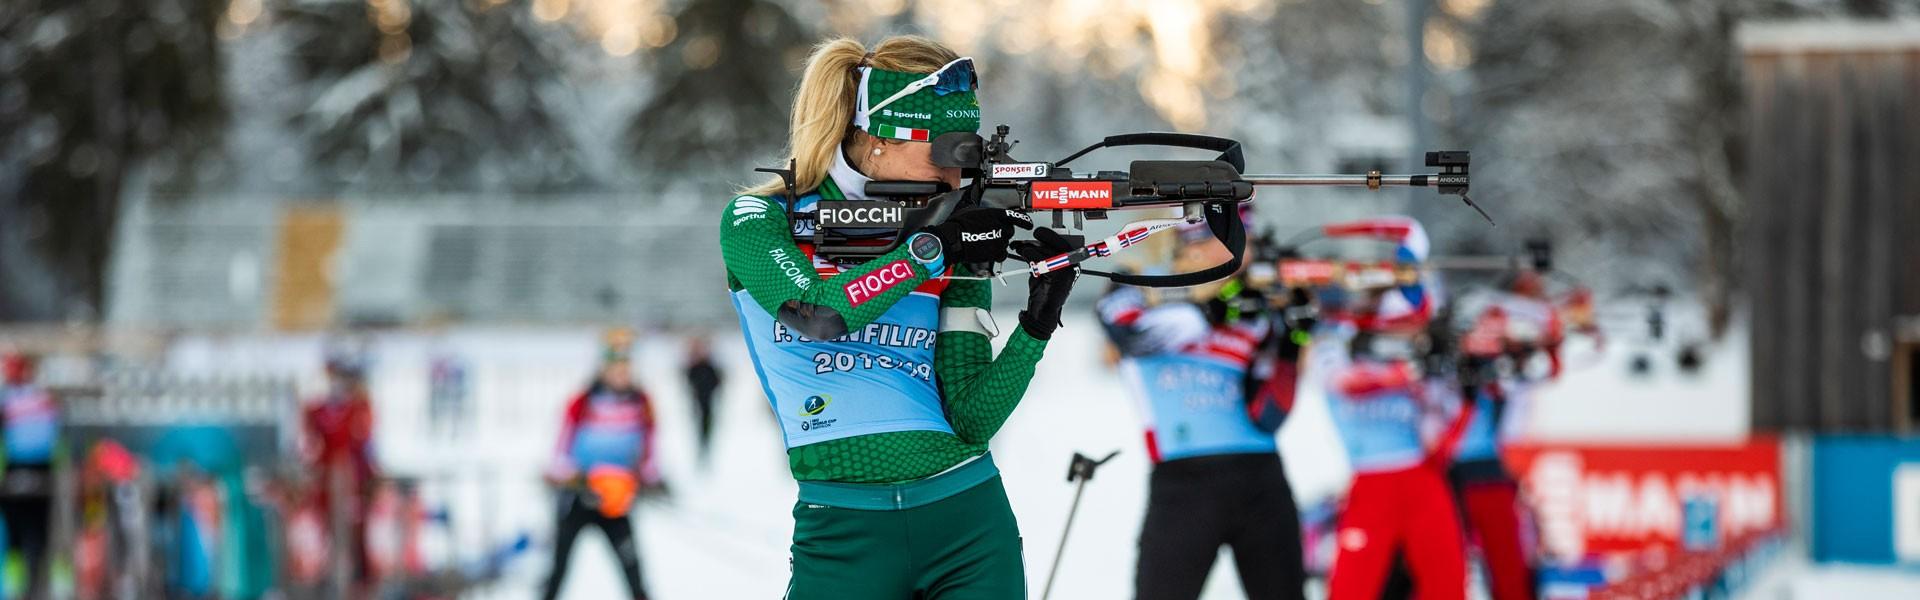 Biathlon 2019 in Ruhpolding